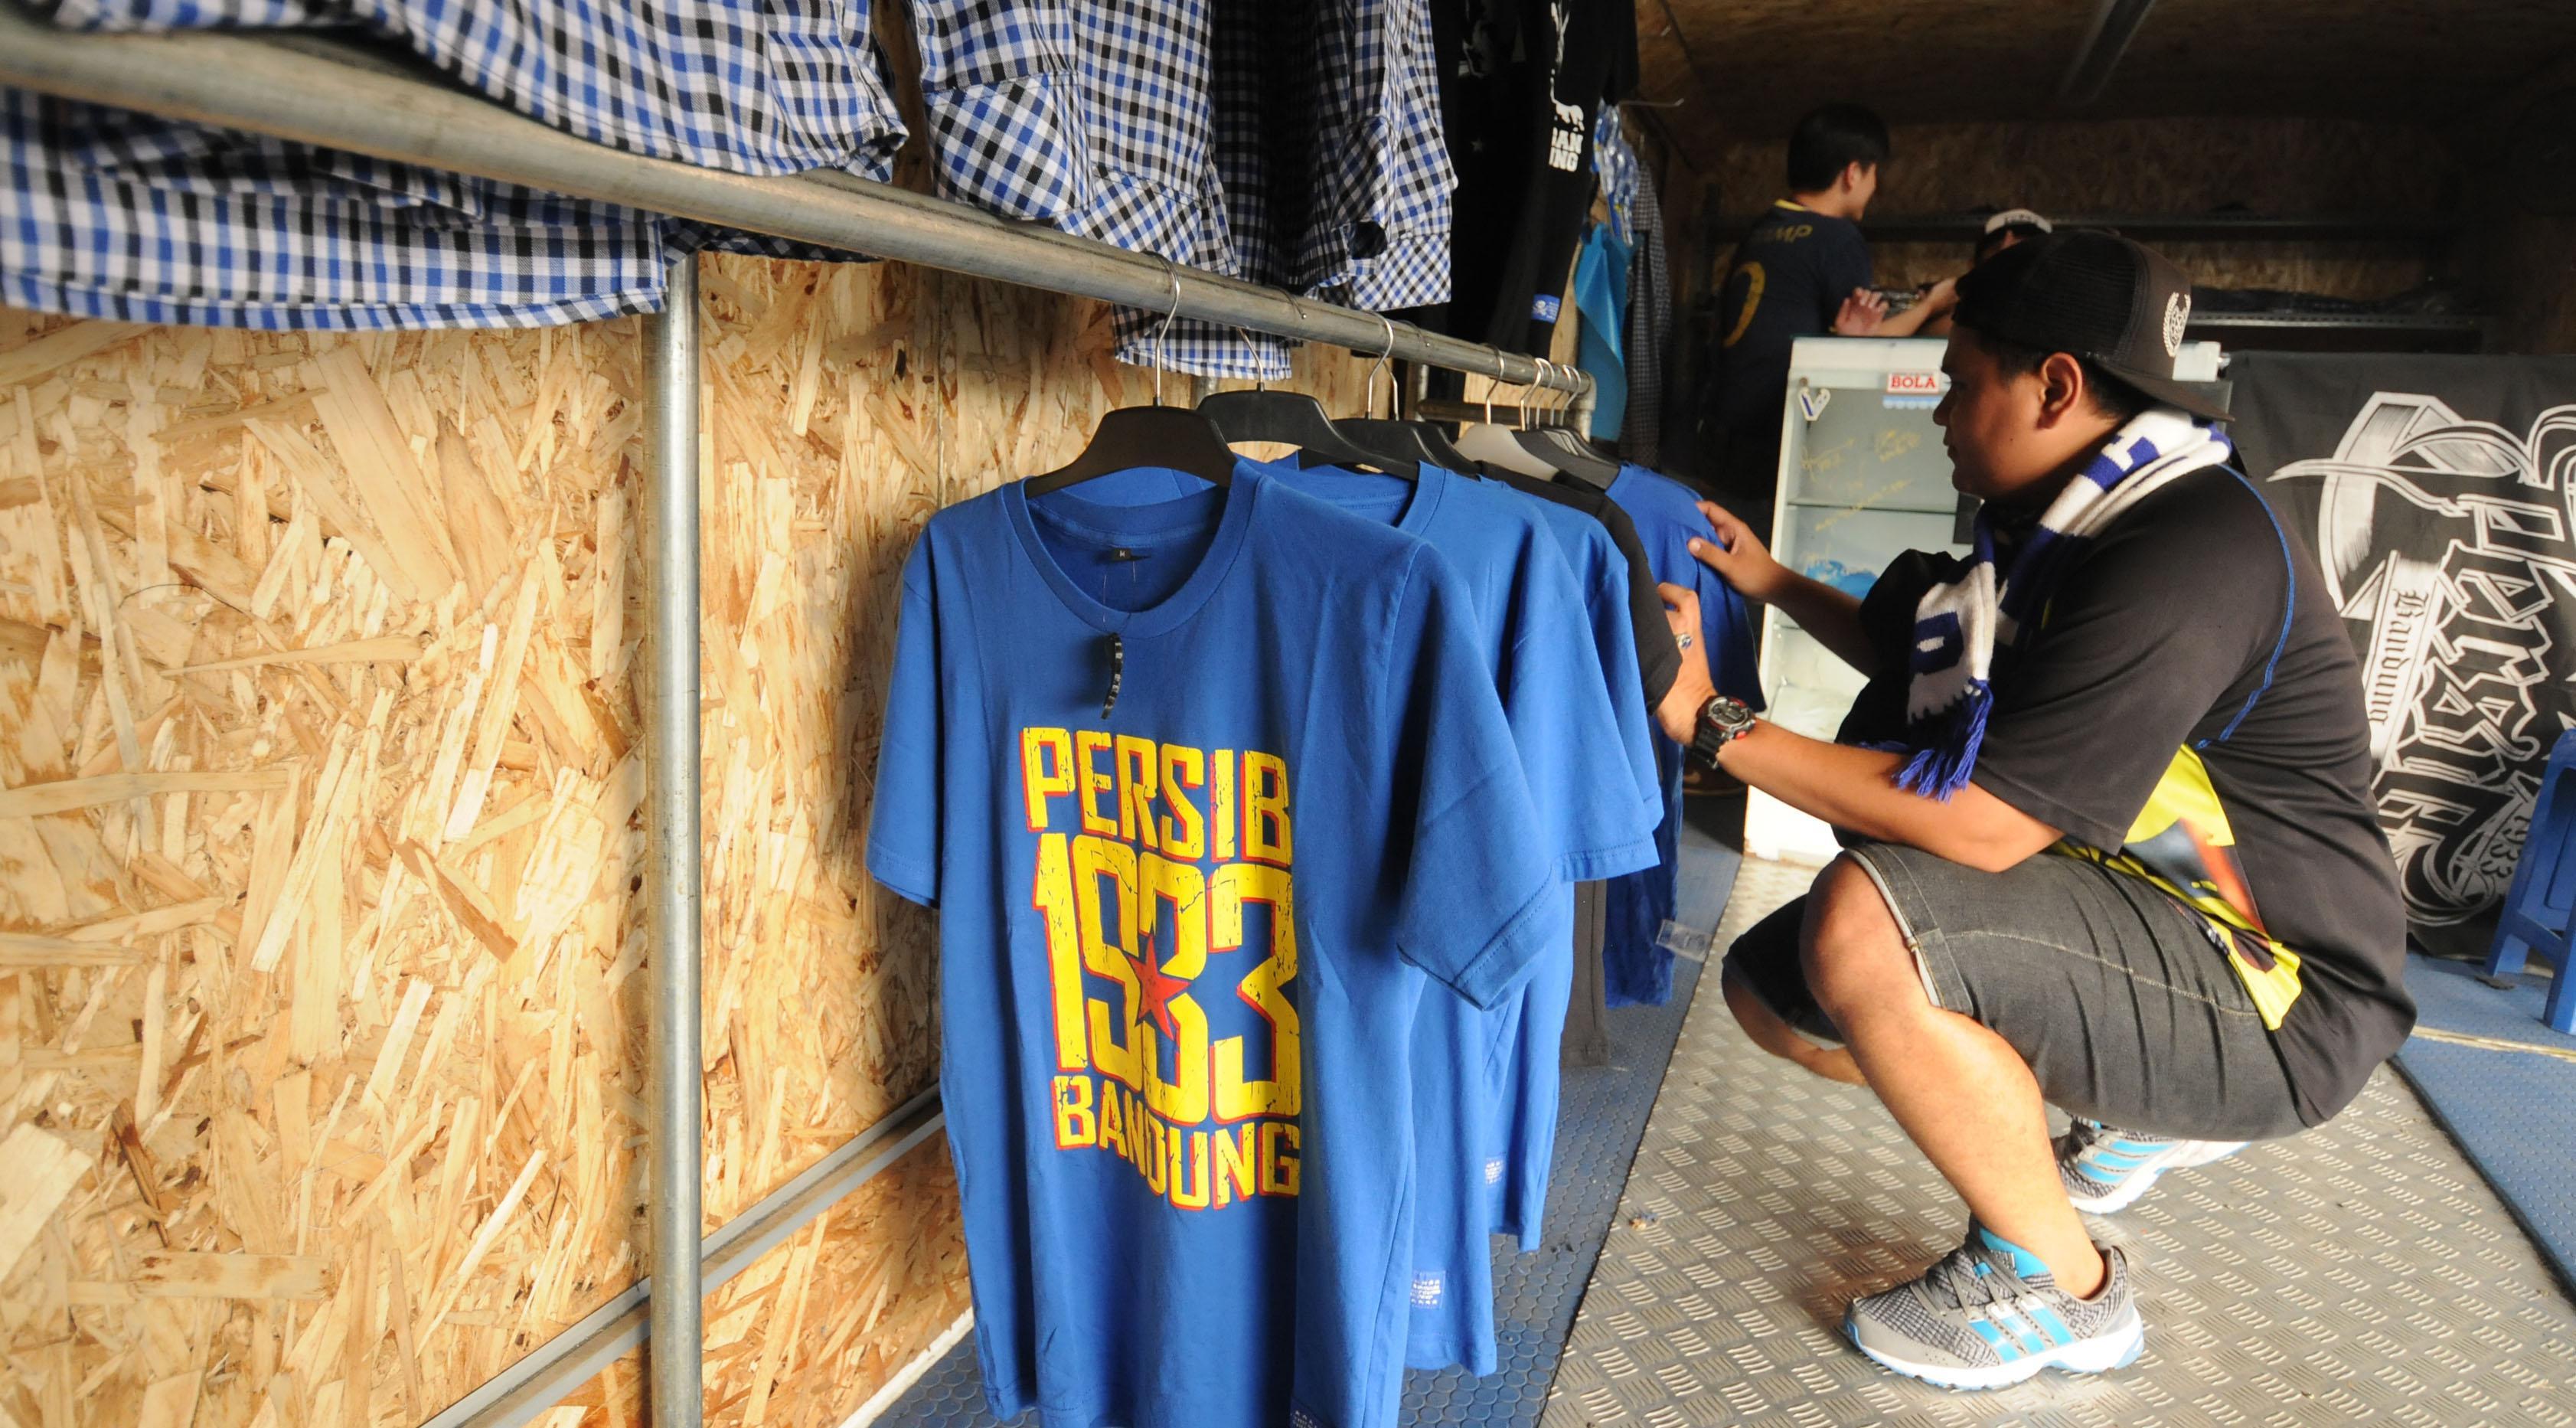 Bus kreatif suporter Persib Bandung di Stadion Si Jalak Harupat, Soreang, Bandung (Liputan6.com/Helmi Fithriansyah)